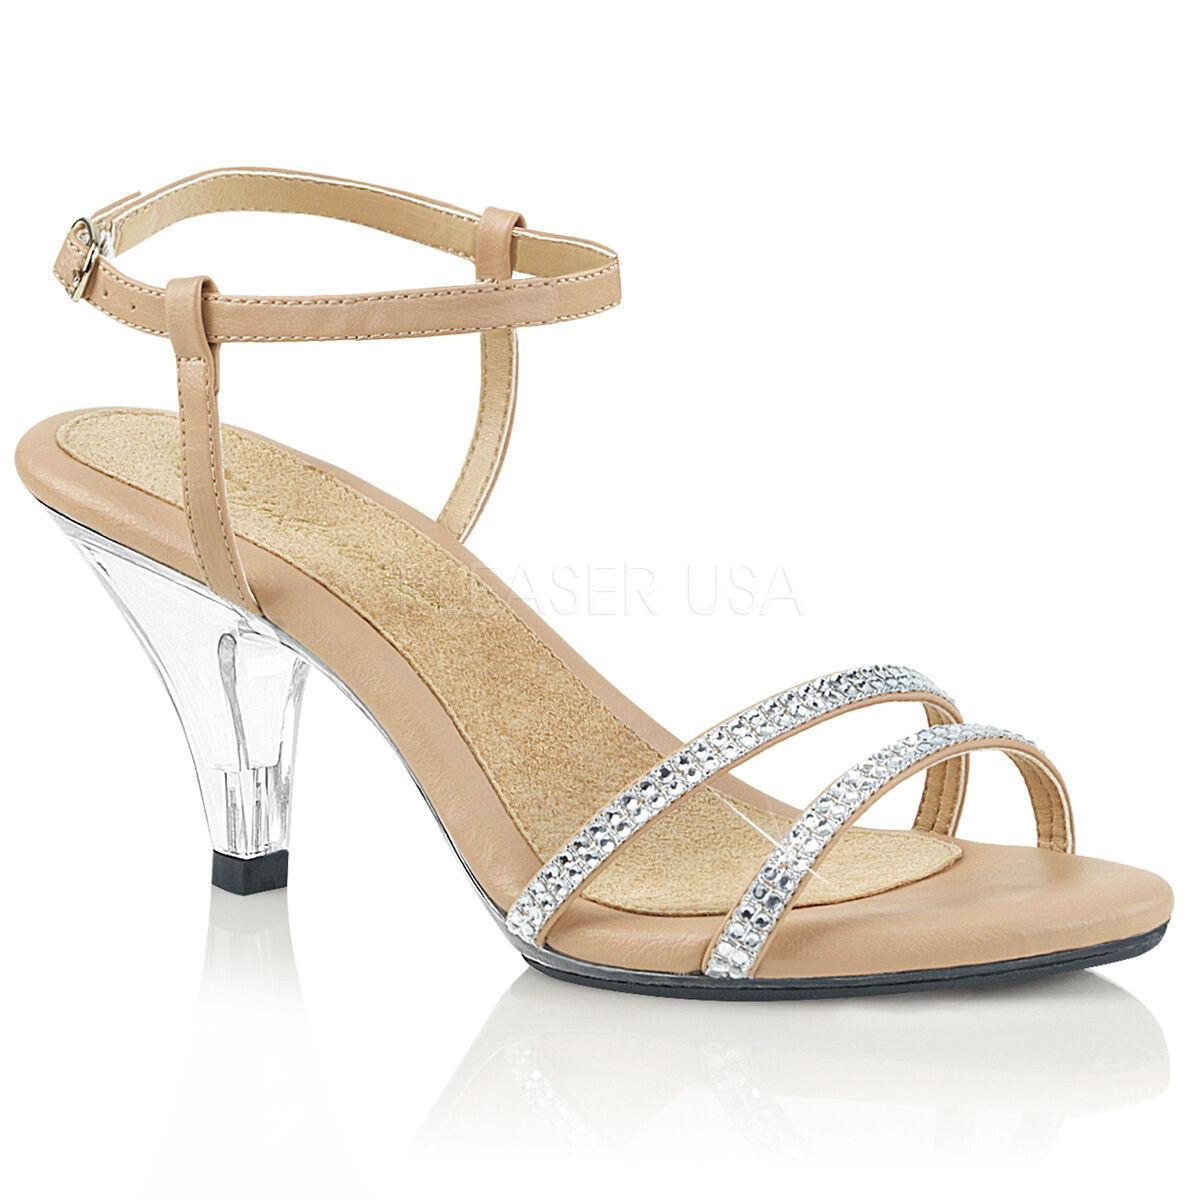 PLEASER Sexy 3  High Heels Tan Cream Sandals shoes w  Rhinestones BEL316 NDPU C